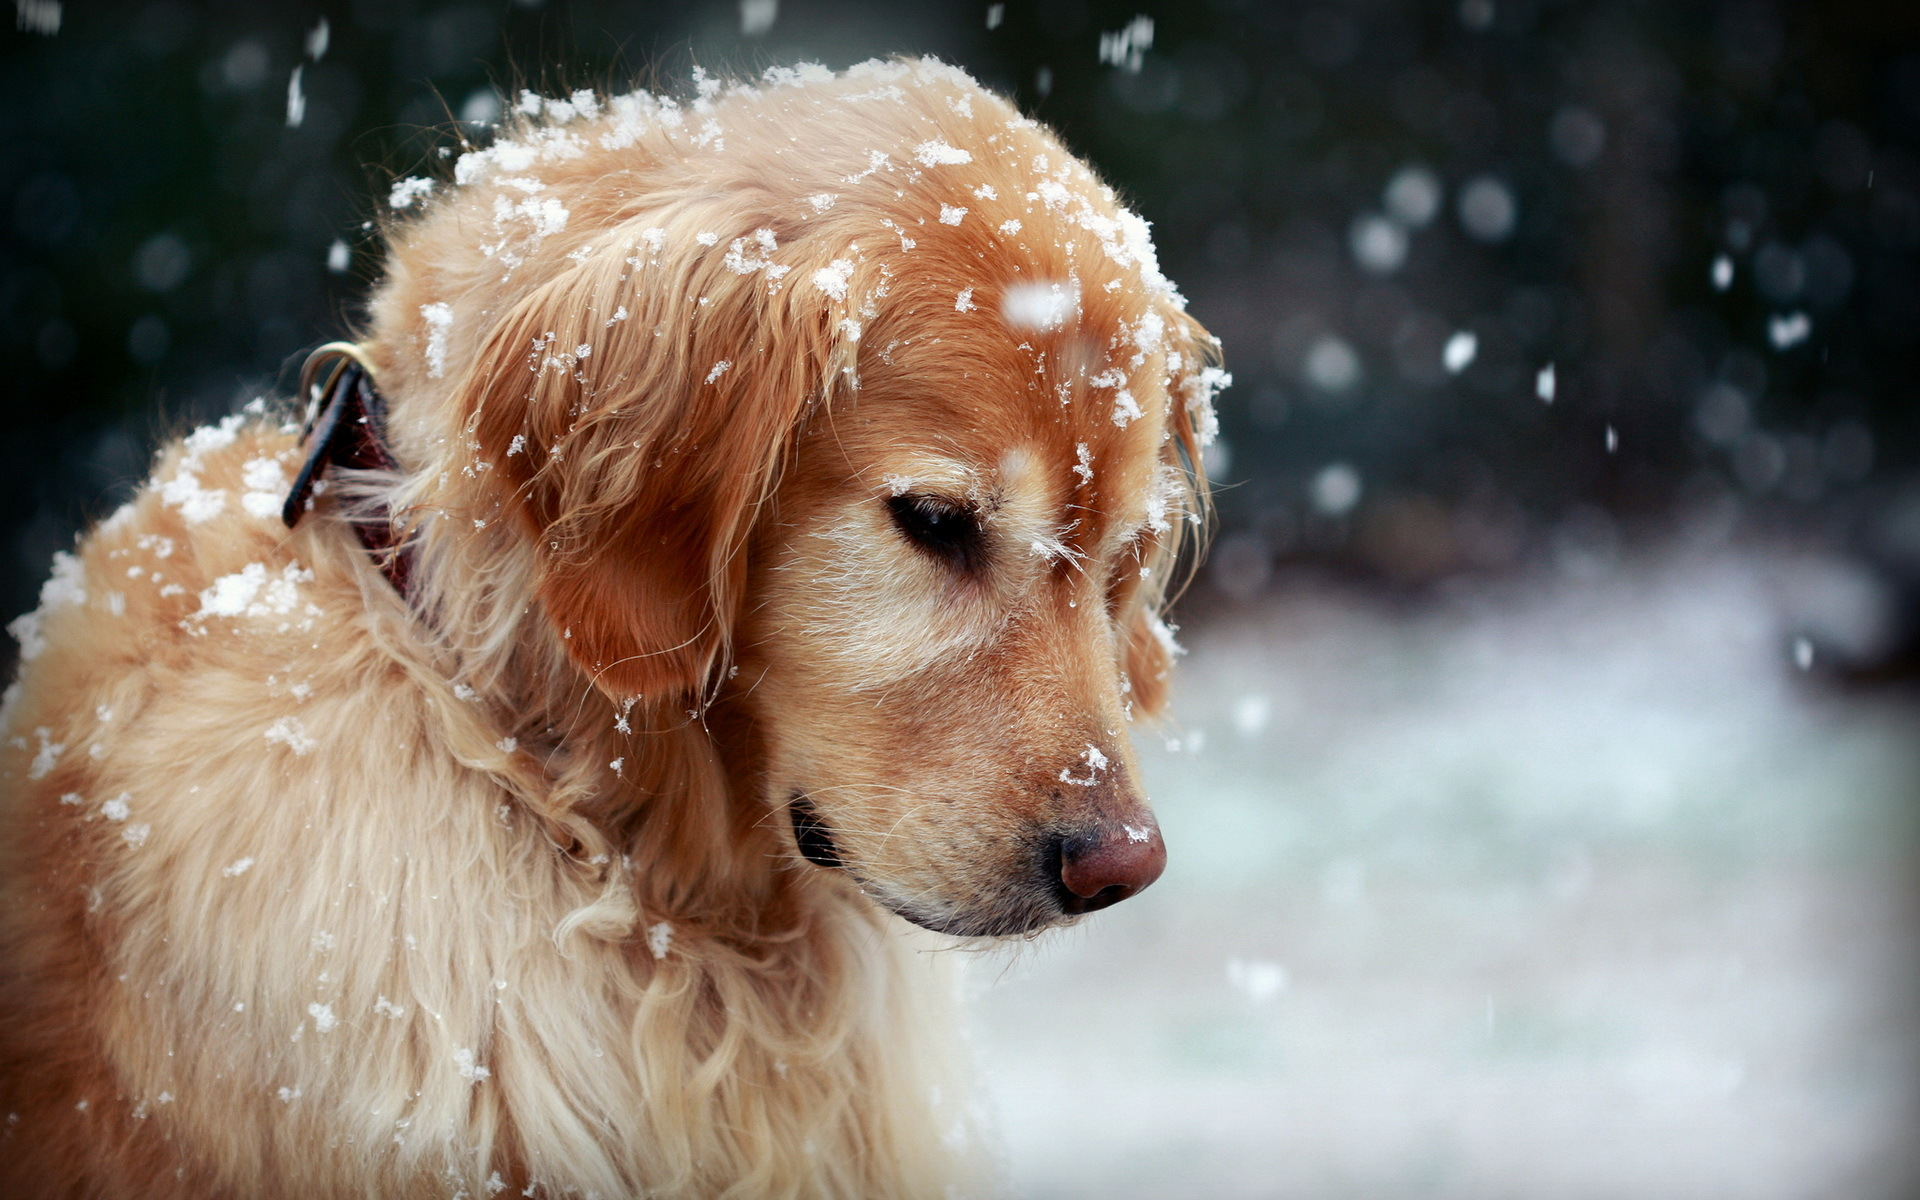 dog winter snow wallpaper background 1920x1200